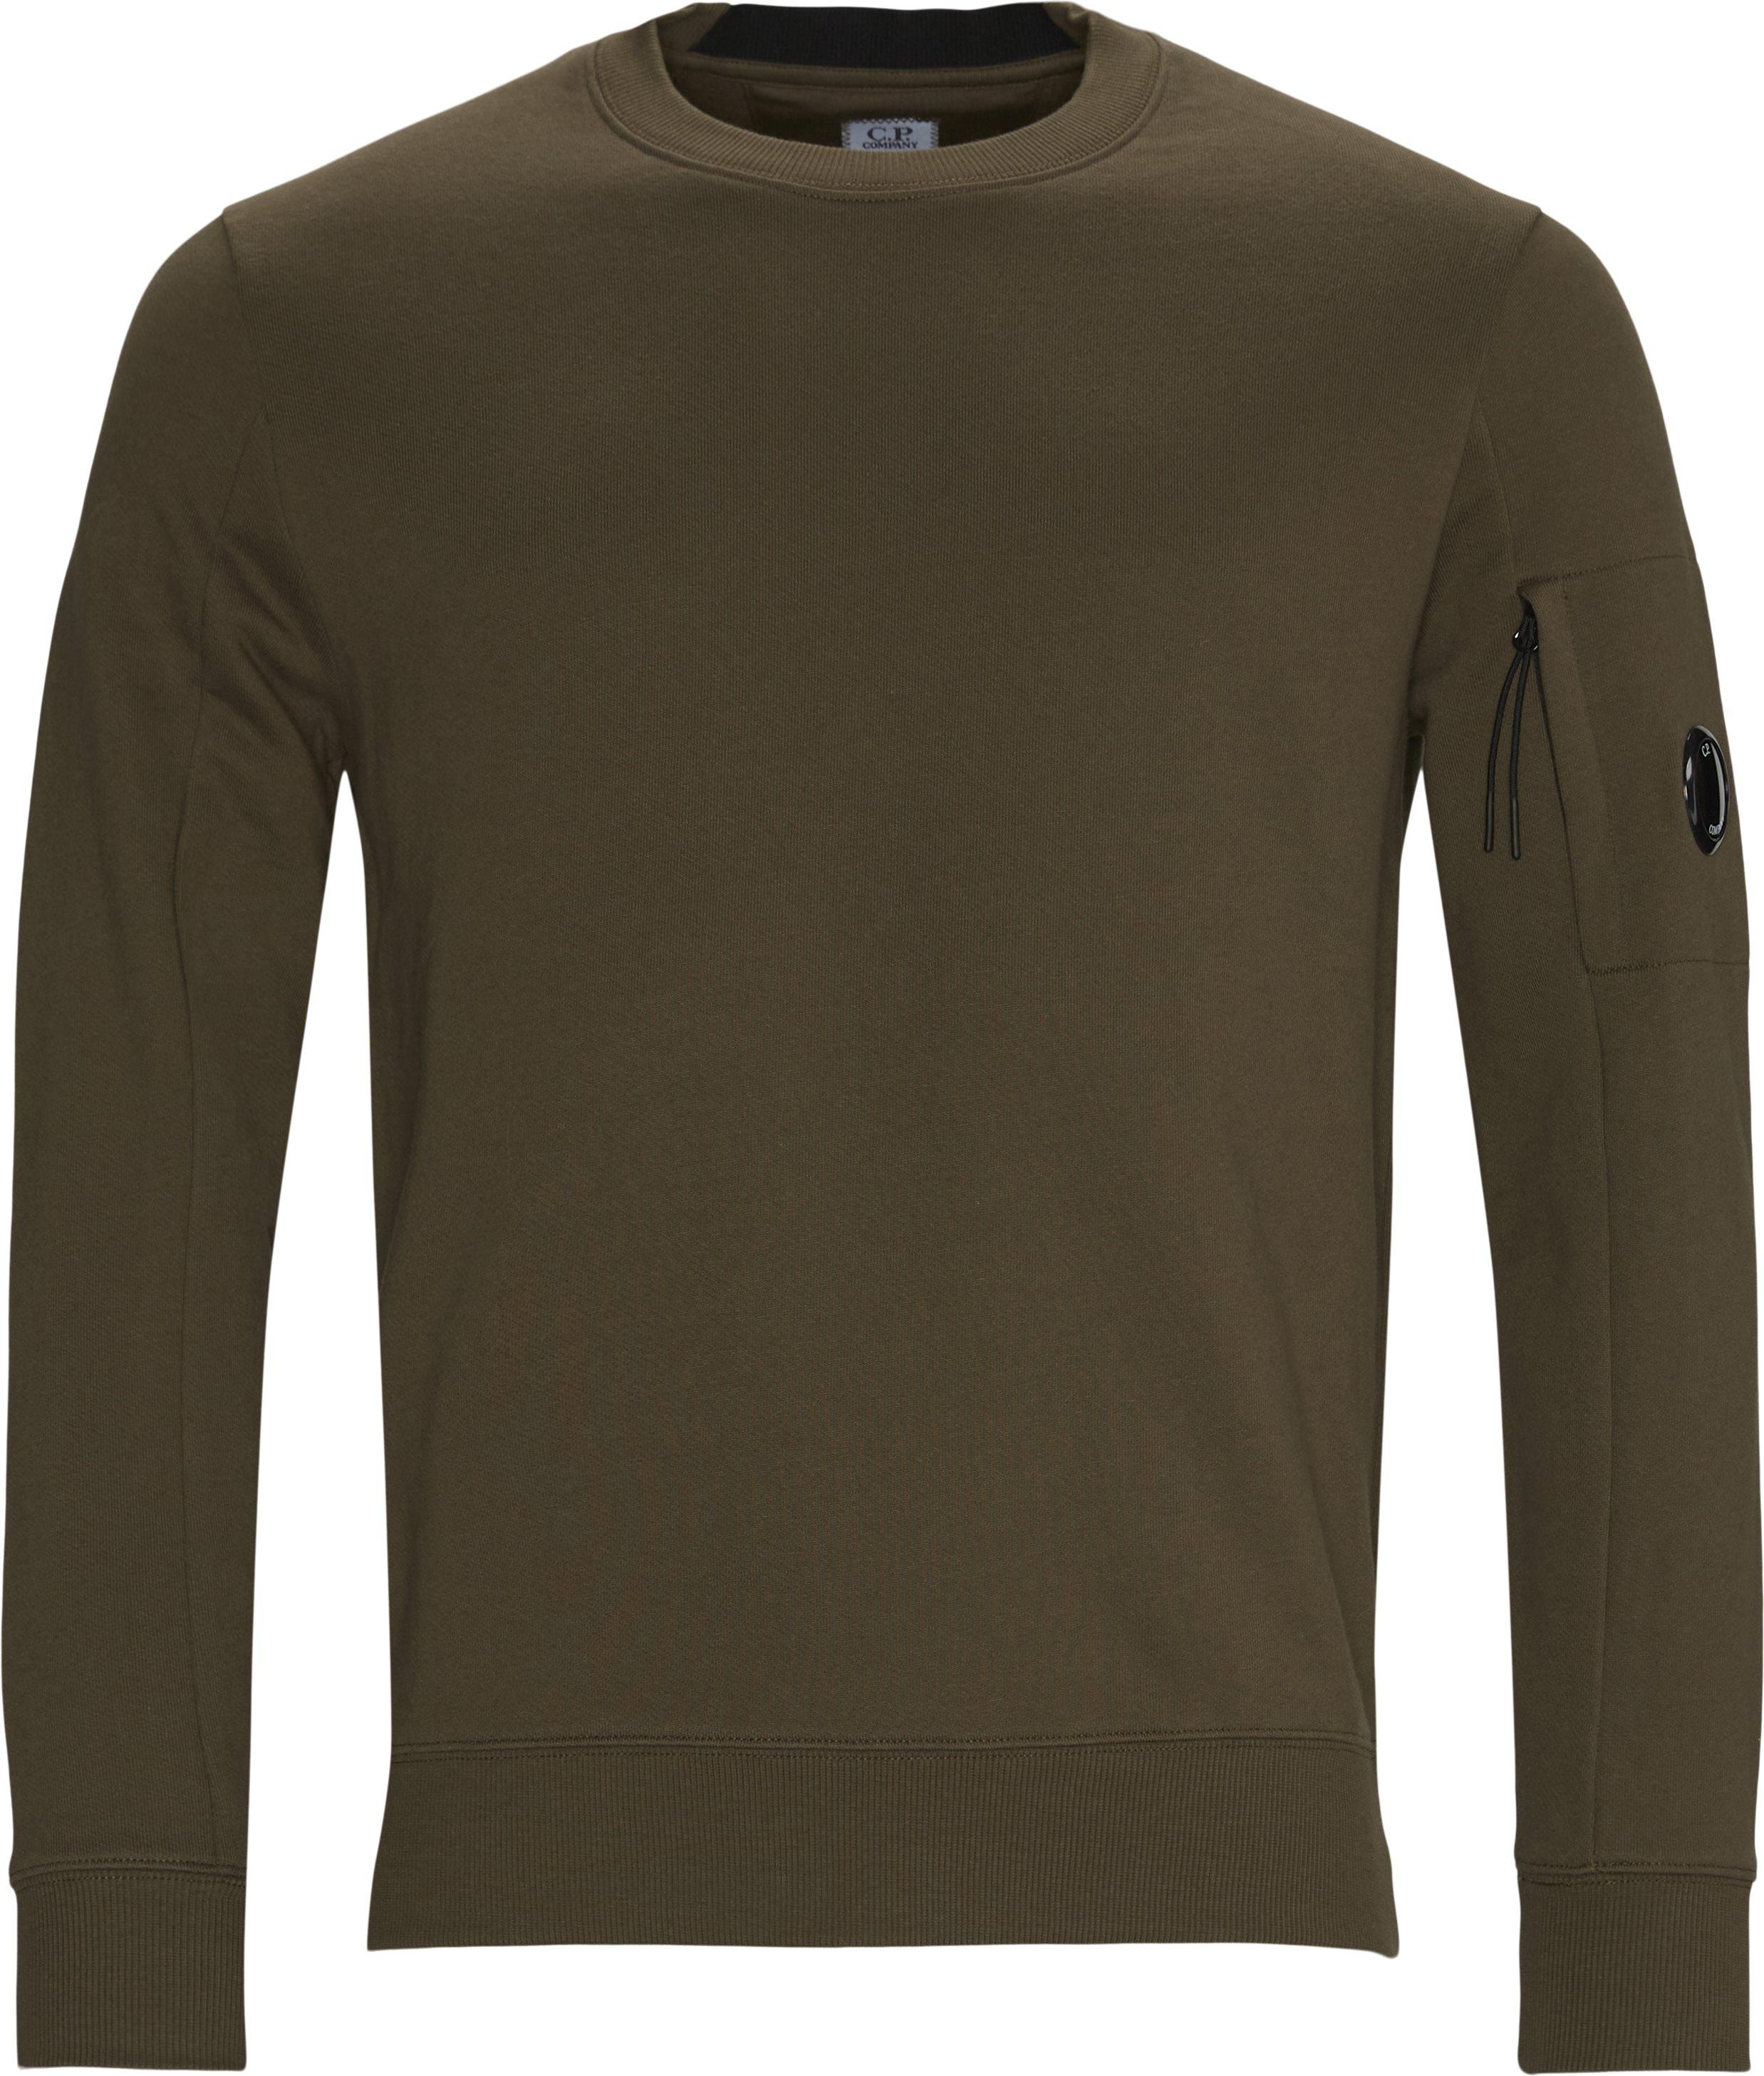 Garment Dyed Light Fleece Lens Crew Sweat - Sweatshirts - Regular fit - Army